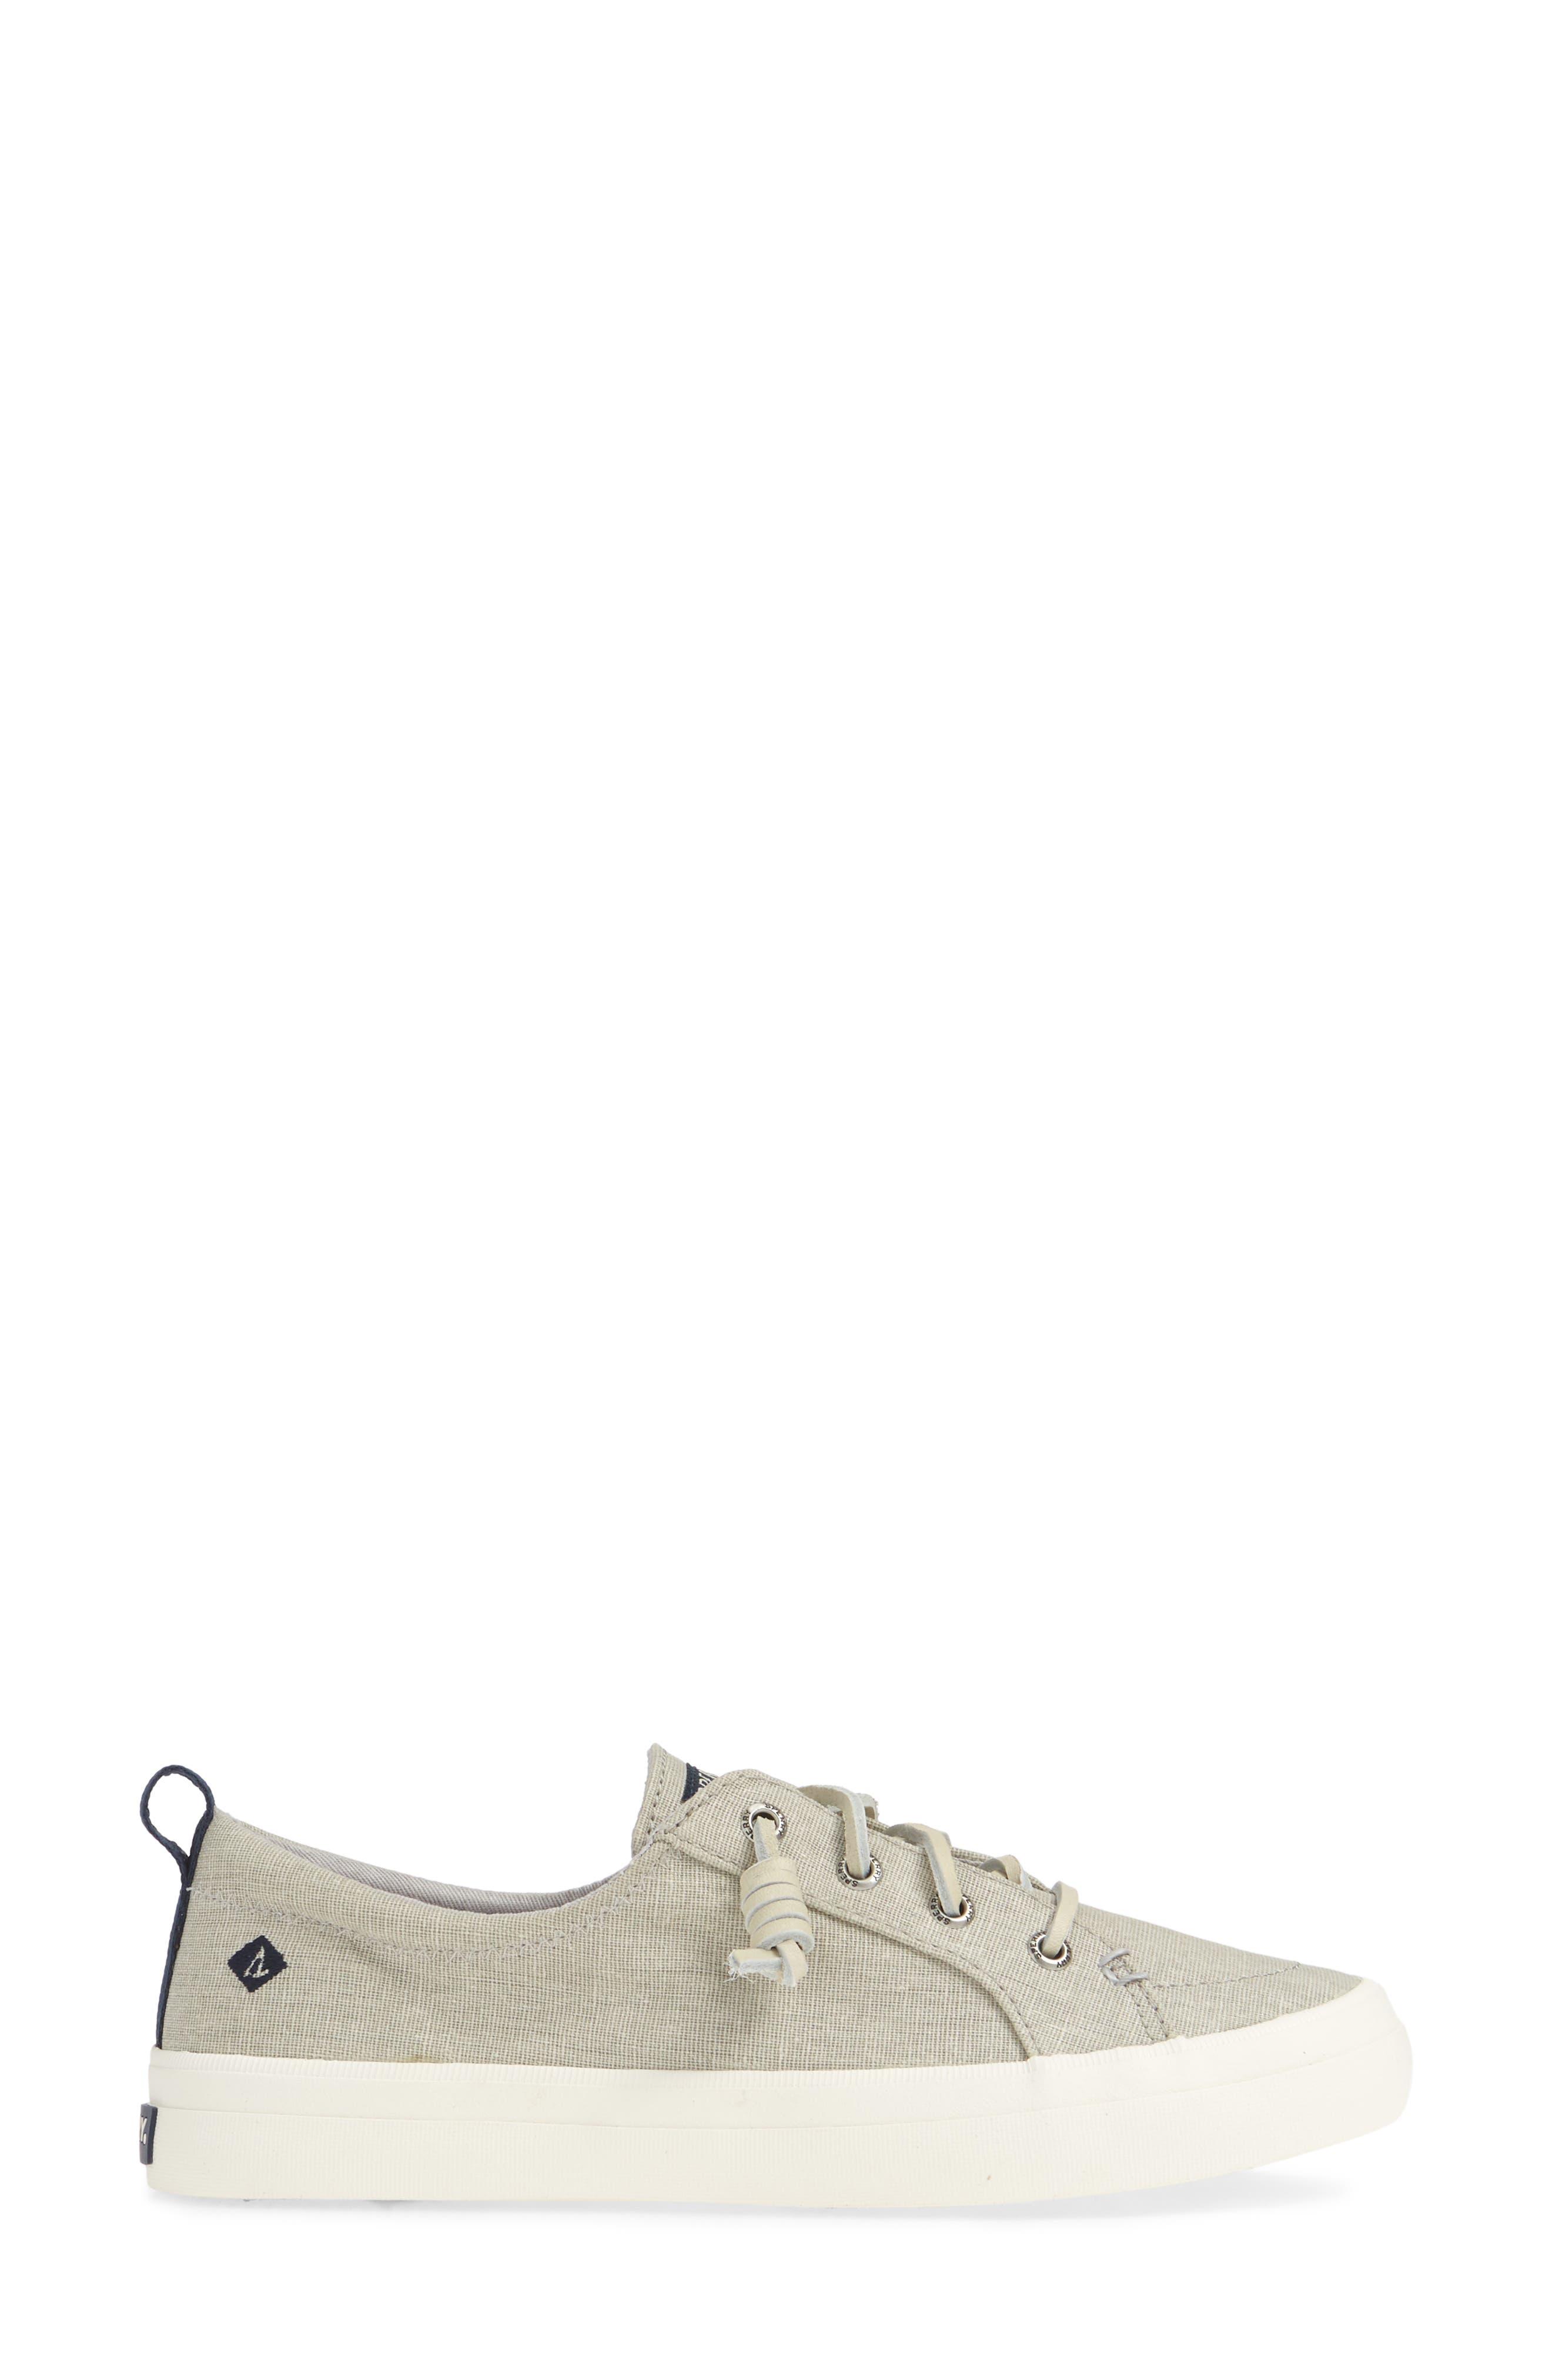 SPERRY, Crest Vibe Sneaker, Alternate thumbnail 3, color, GREY LINEN FABRIC